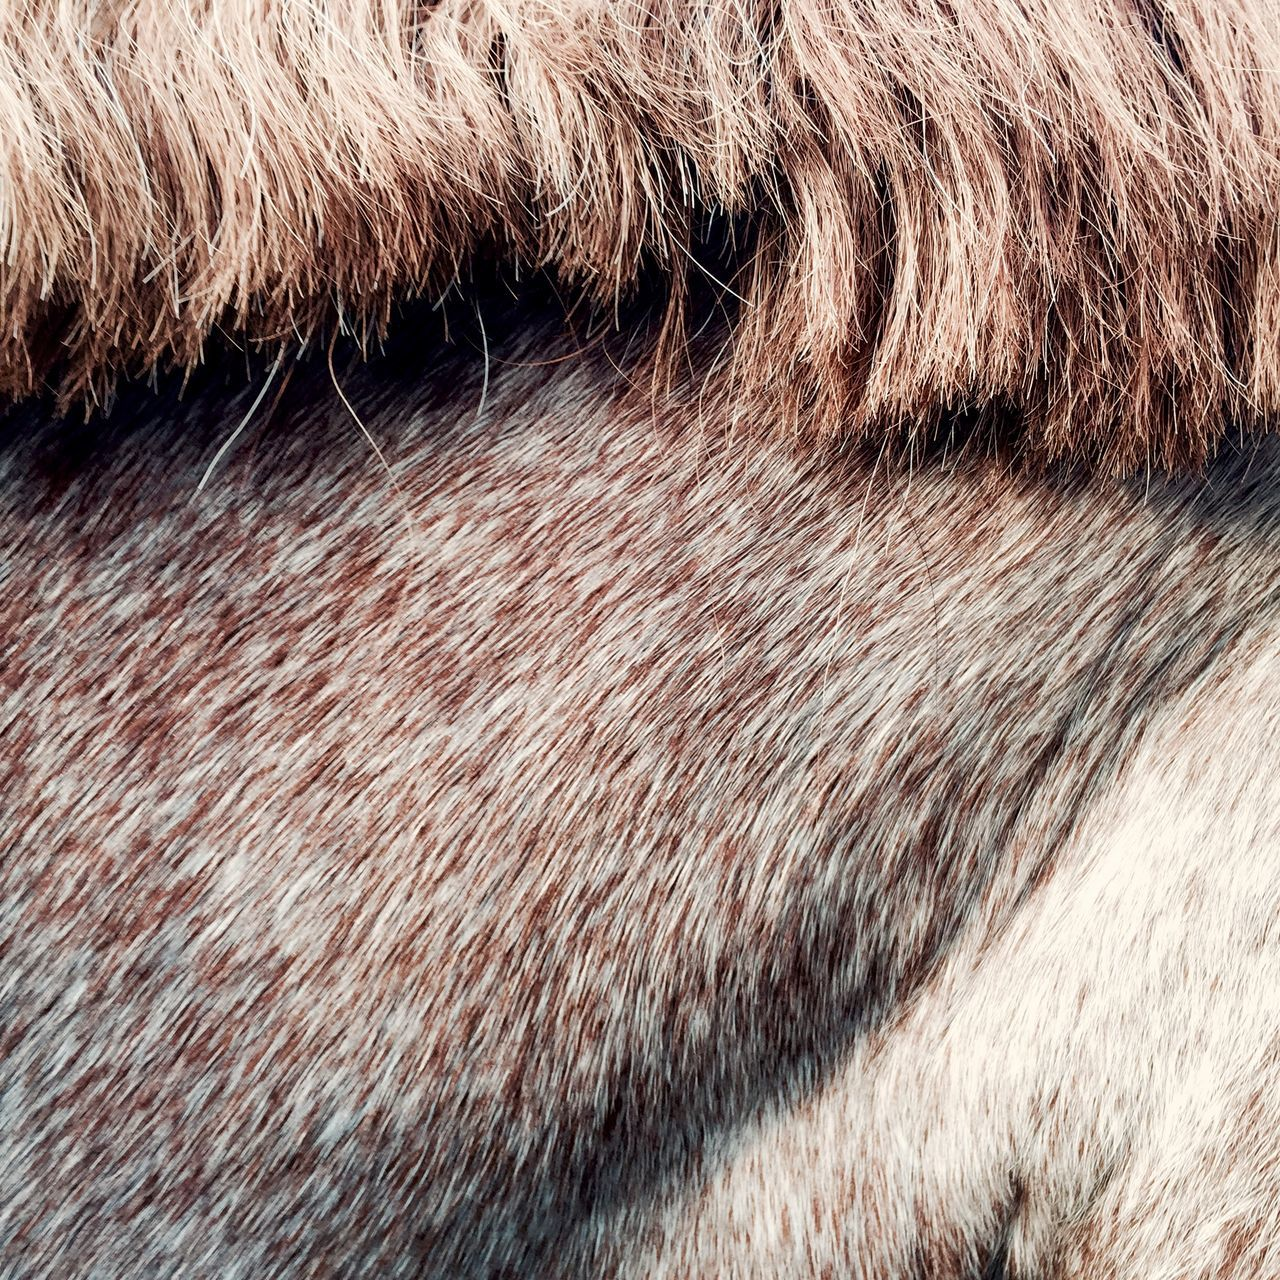 Horses Detail